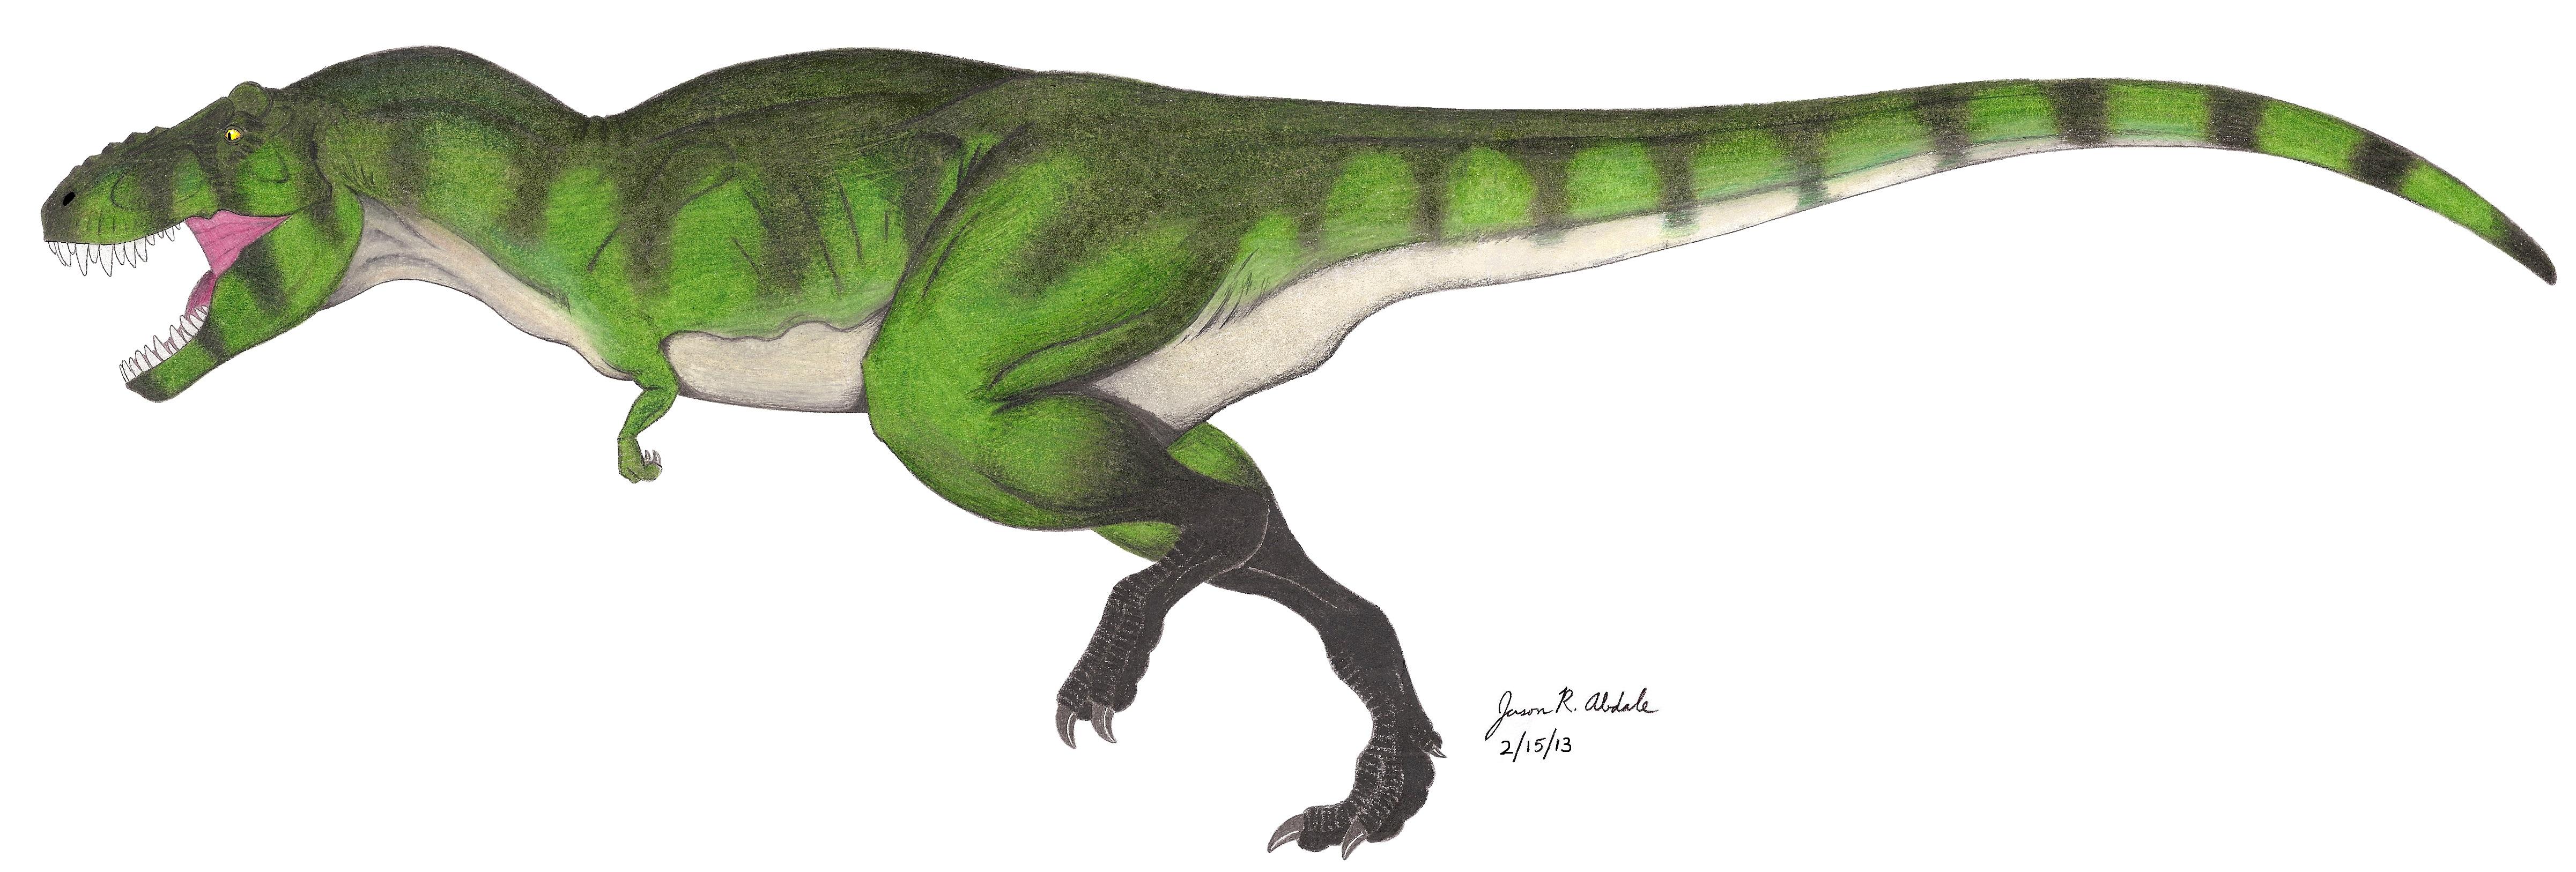 Tyrannosaurus Drawing at GetDrawings.com | Free for personal use ...